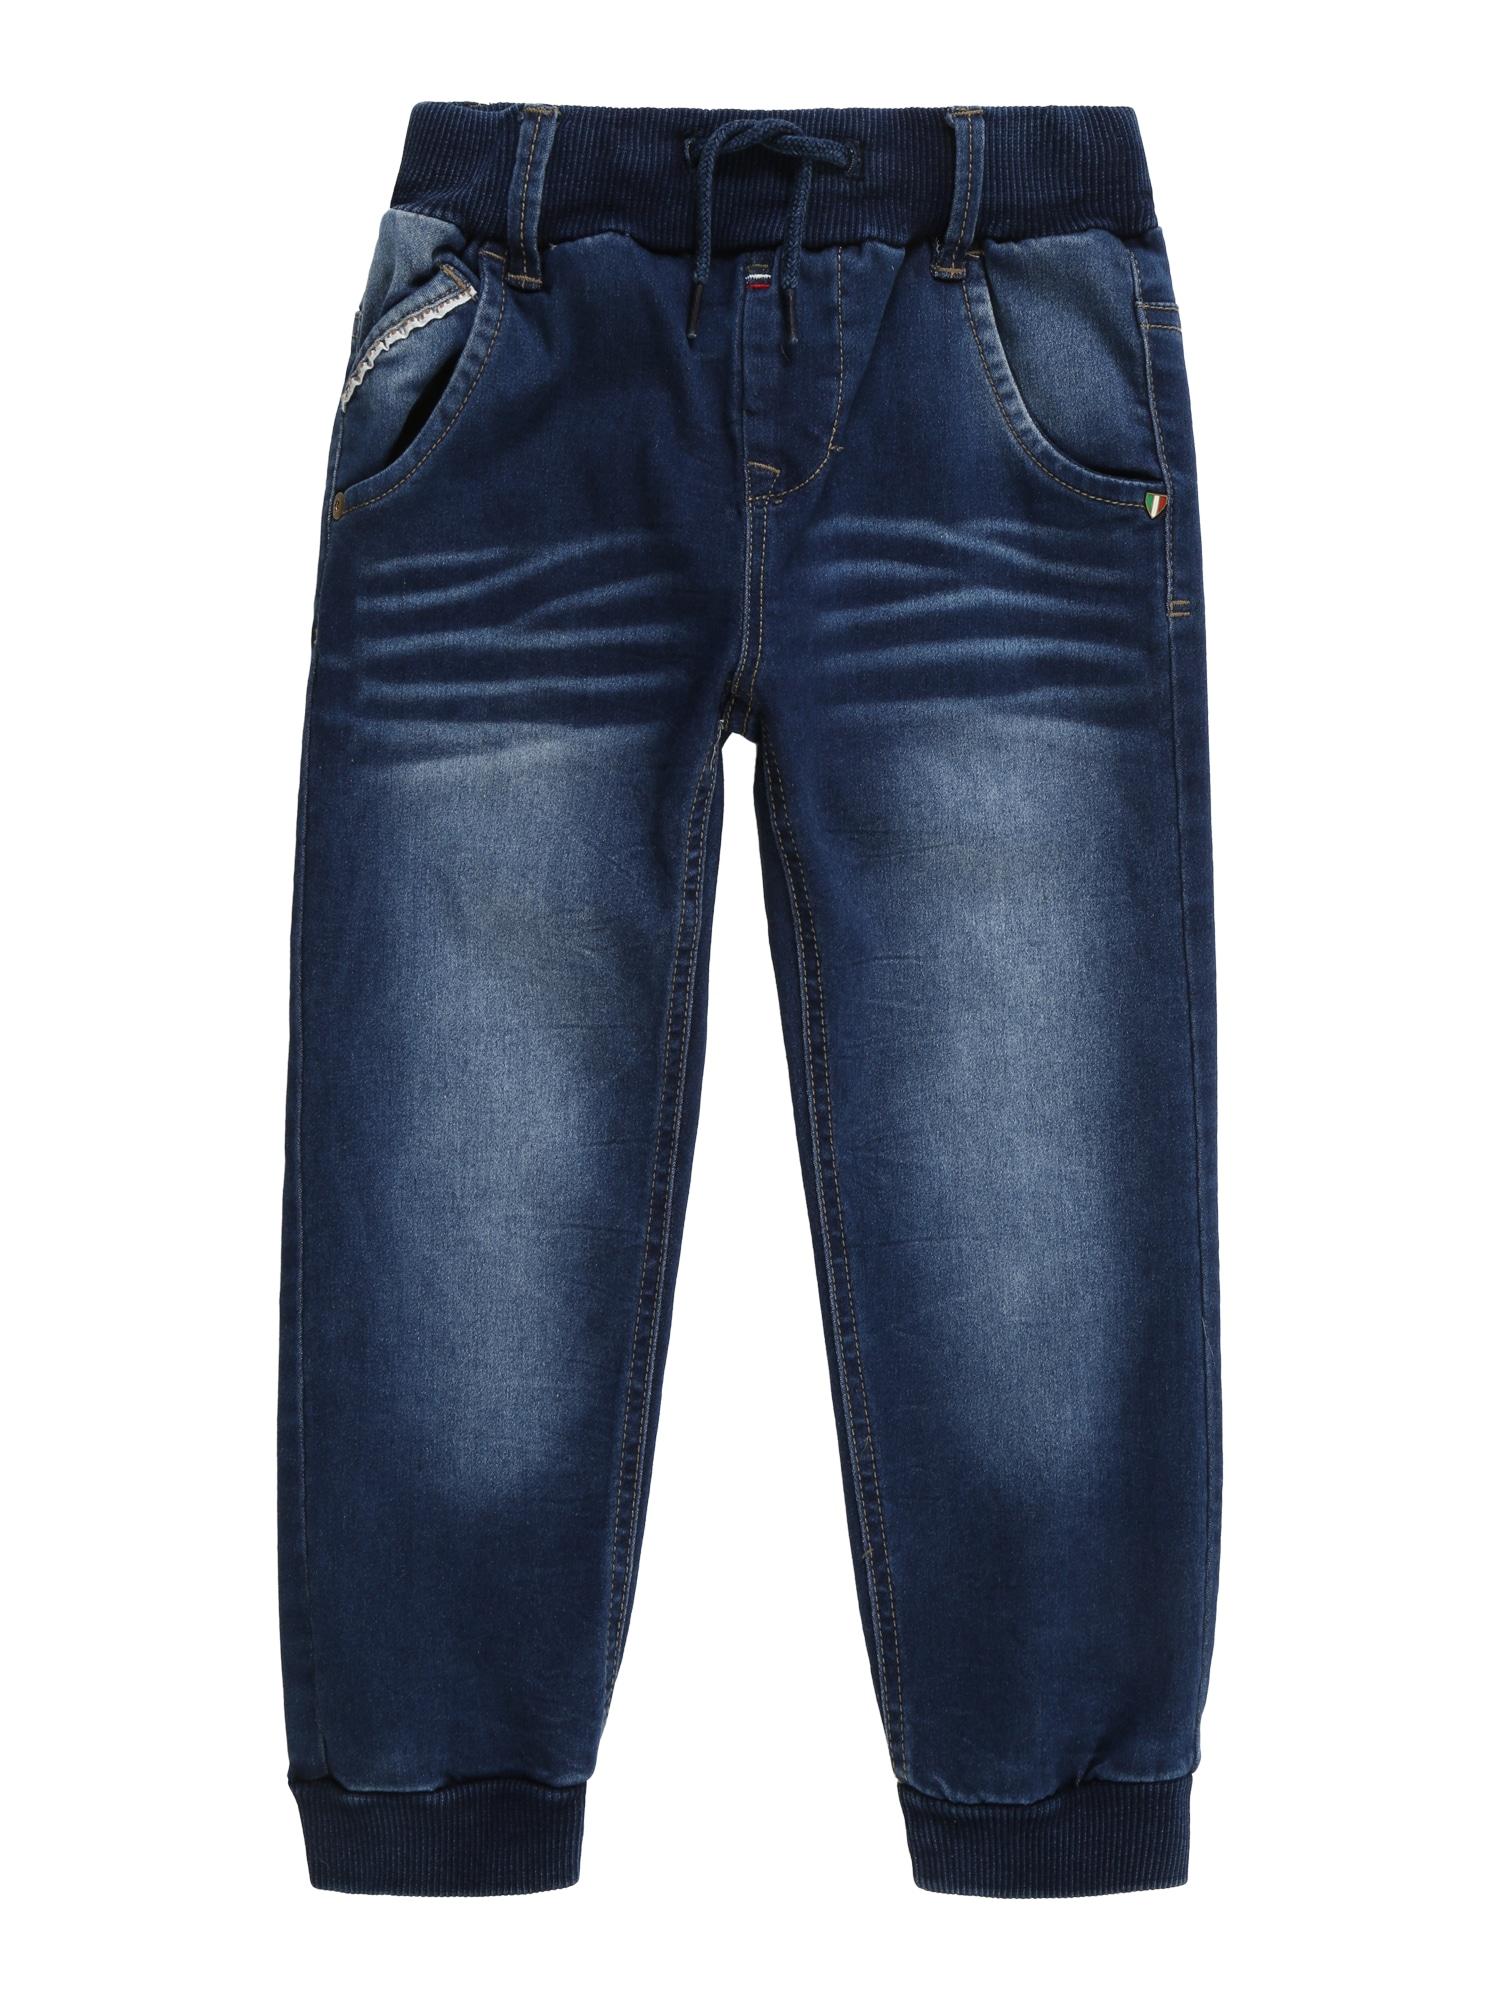 Miniboyhosen - Jeans 'Bob Tolly' - Onlineshop ABOUT YOU